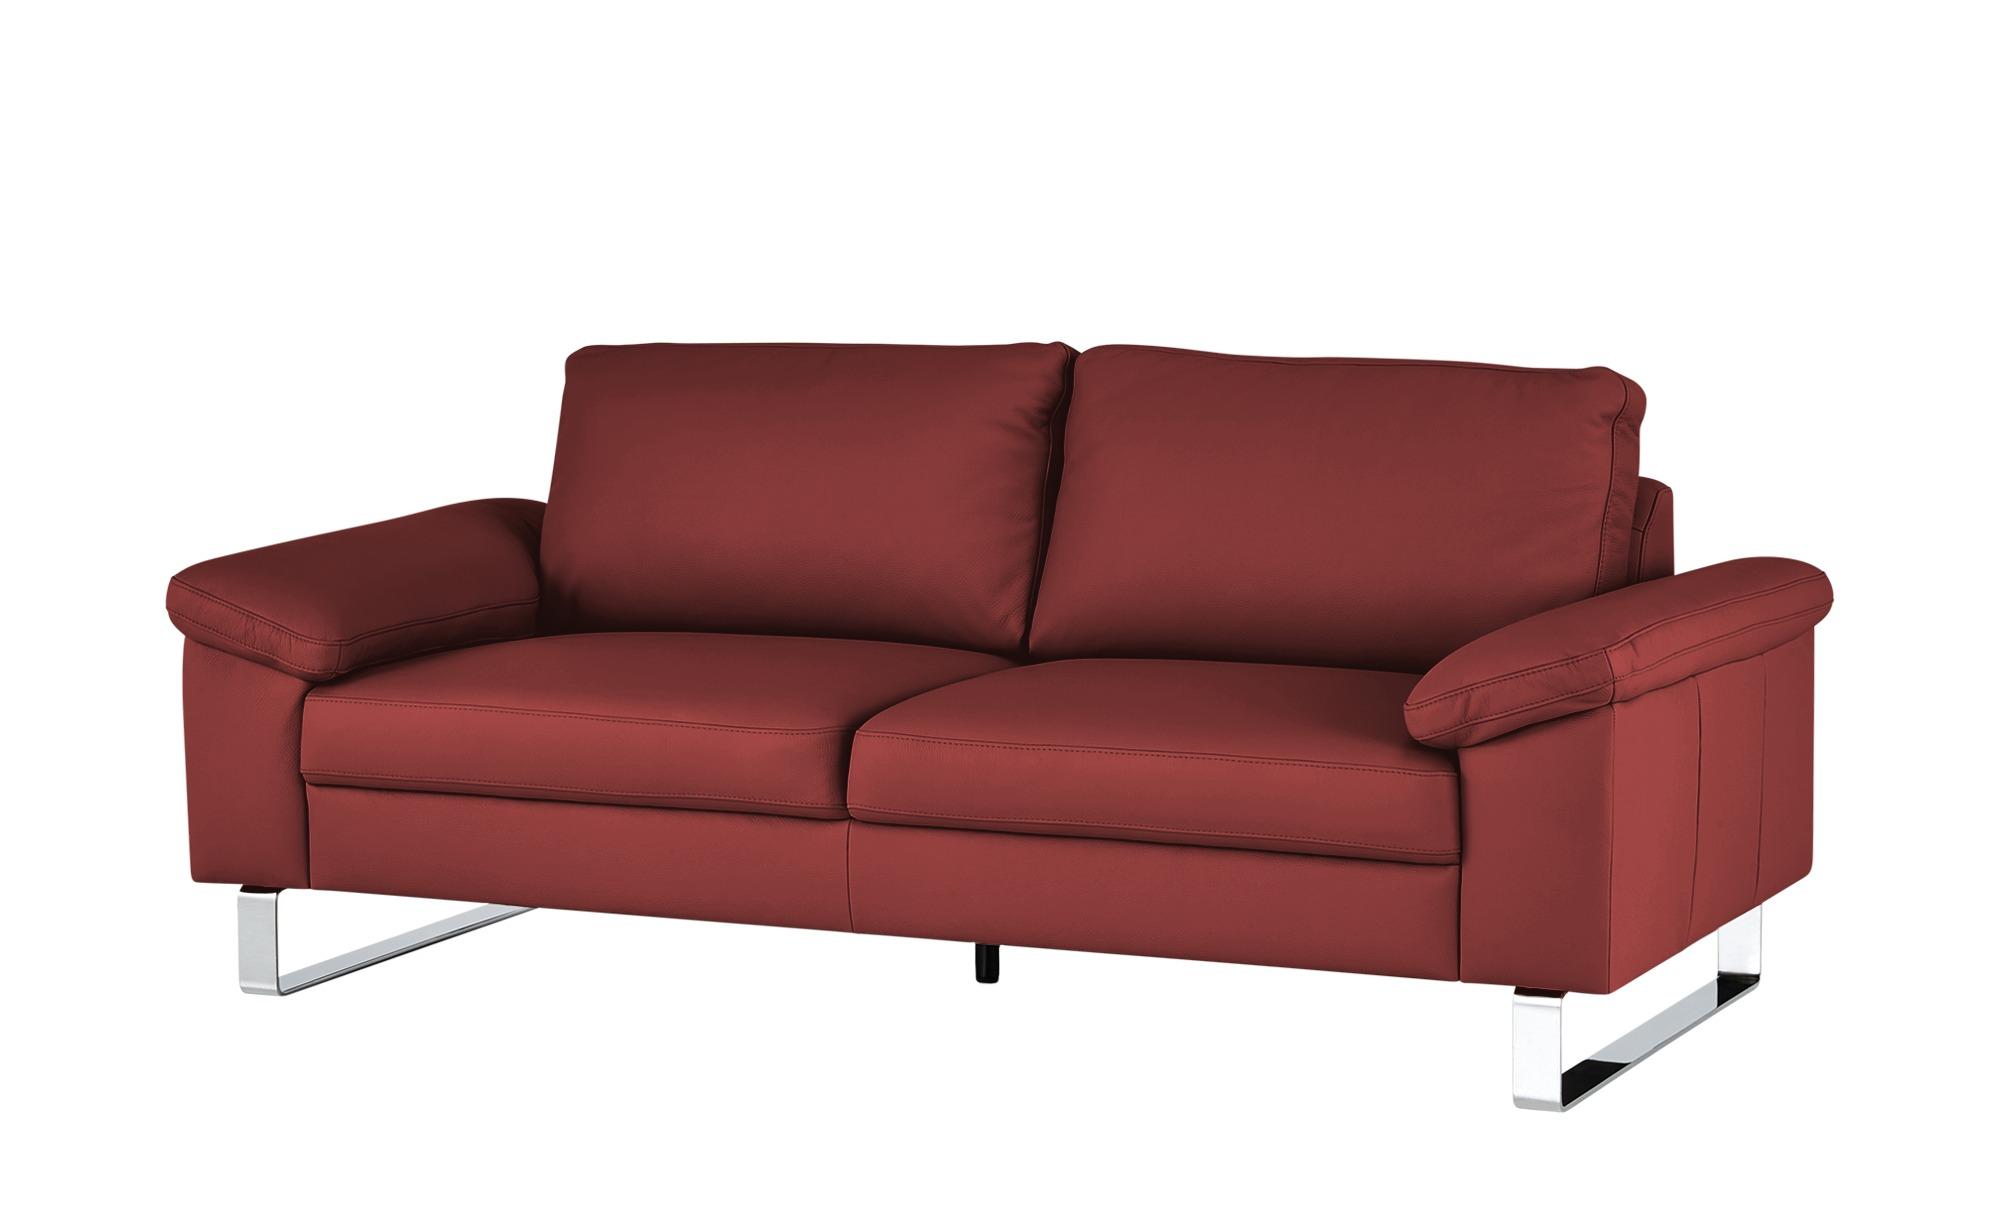 Max Schelling Ledersofa  Maximum ¦ rot ¦ Maße (cm): B: 140 H: 86 T: 97 Polstermöbel > Sofas > 2-Sitzer - Höffner